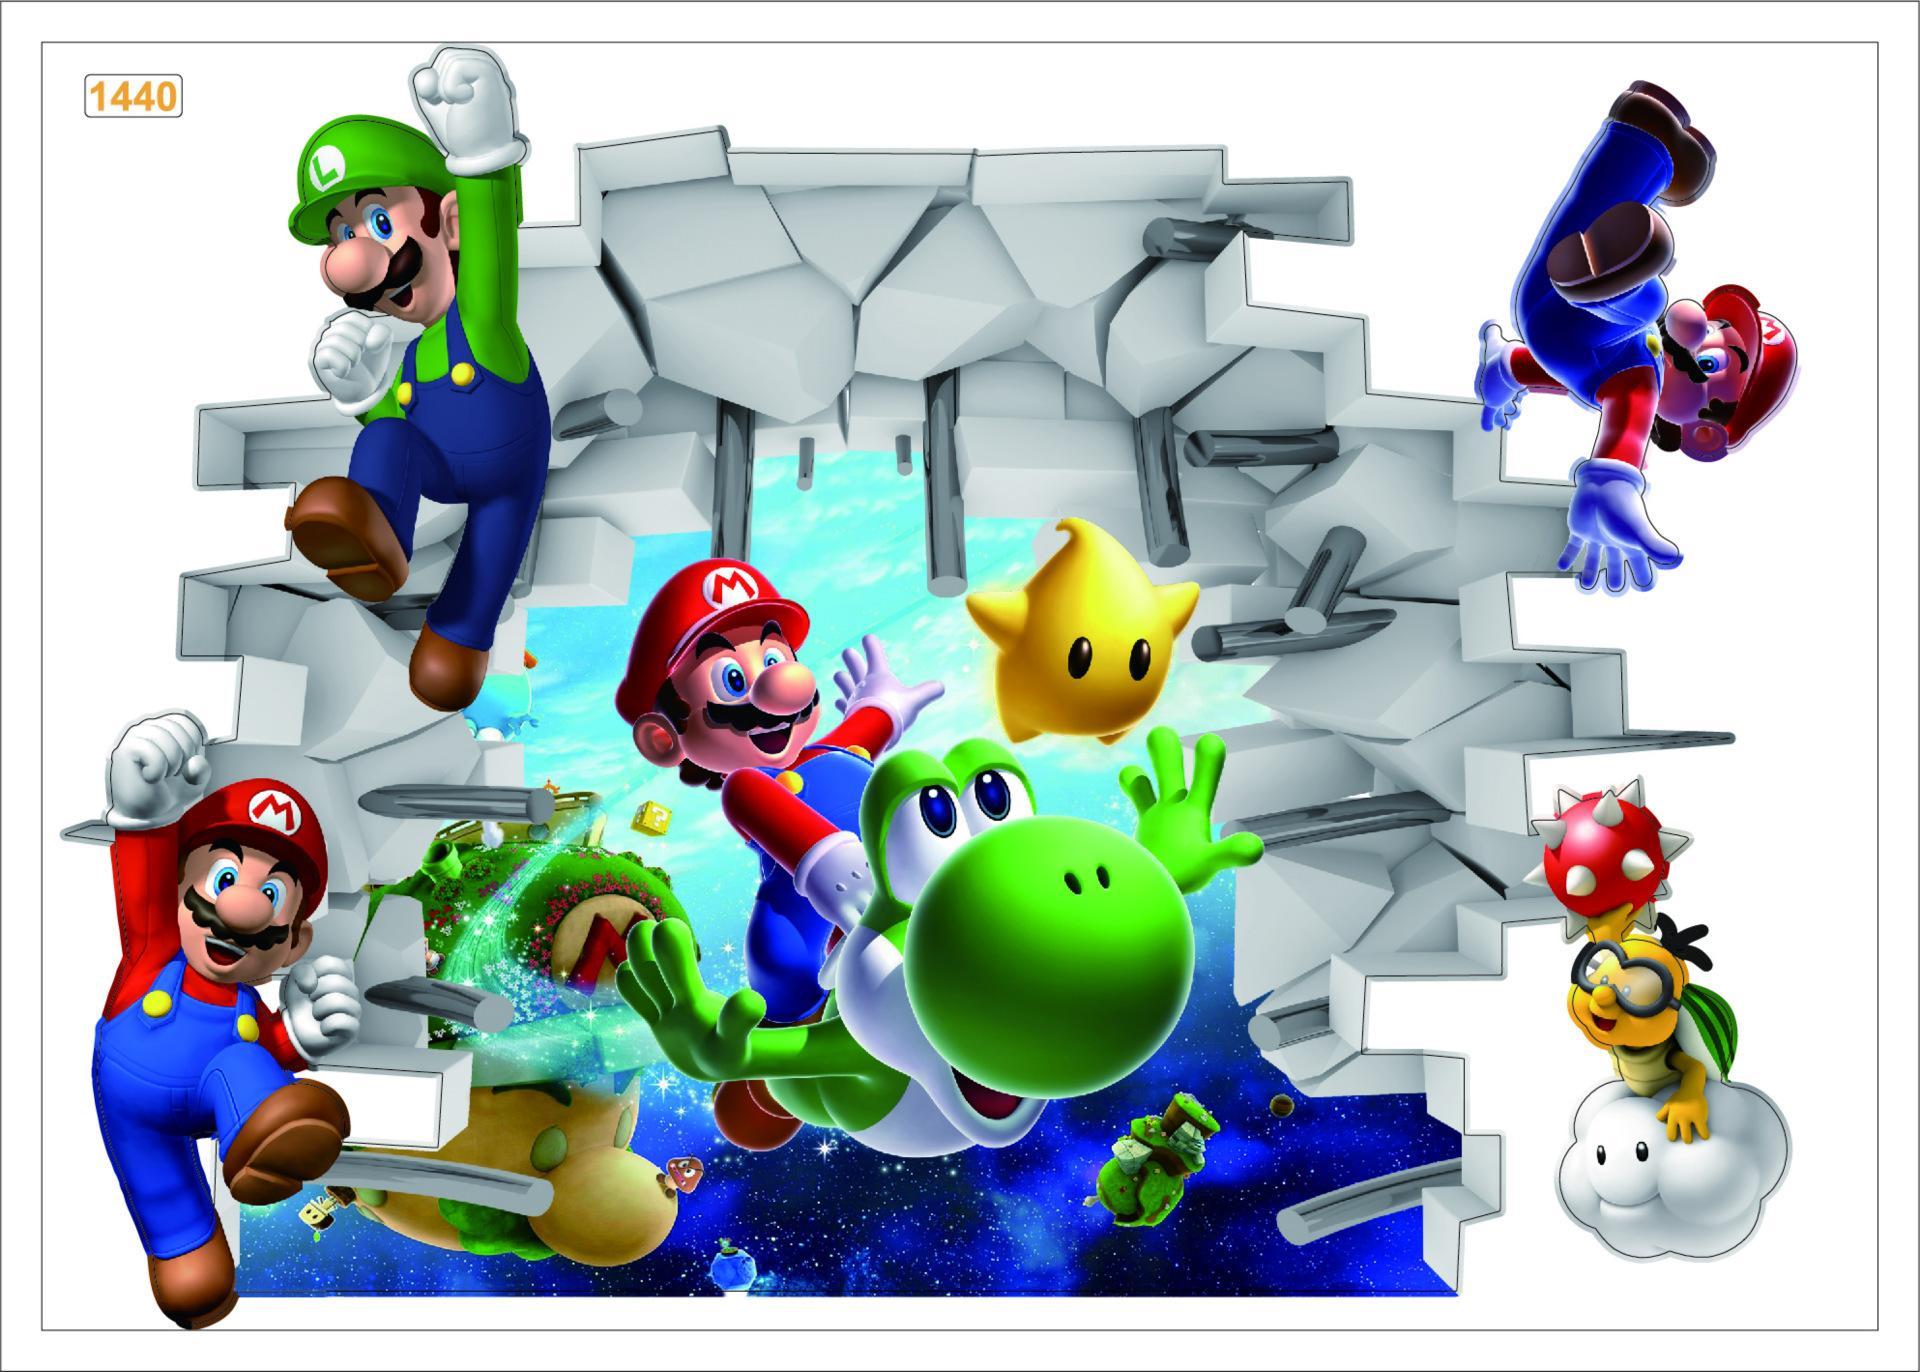 Hot Sale Super Mario Art Mural Wall Decal DIY Classic Cartoon DIY ...